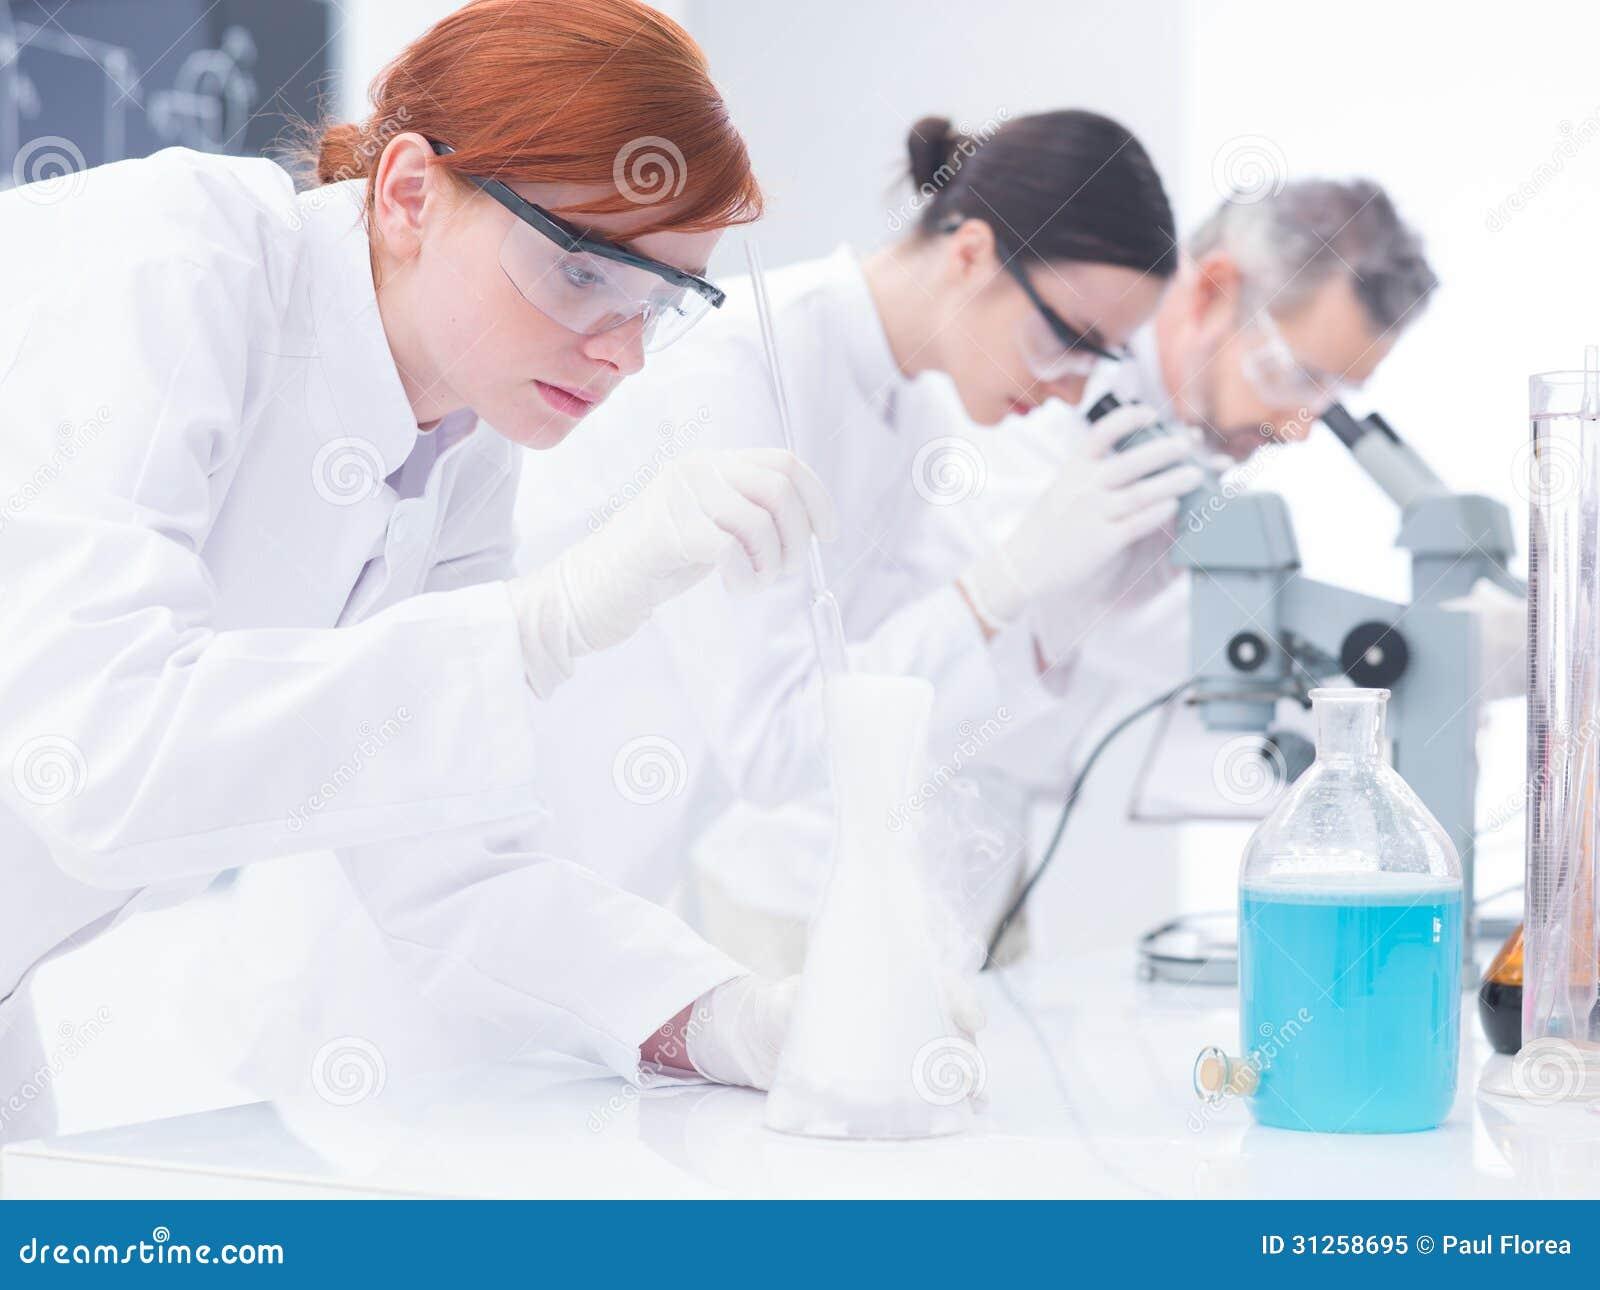 Organometallics and